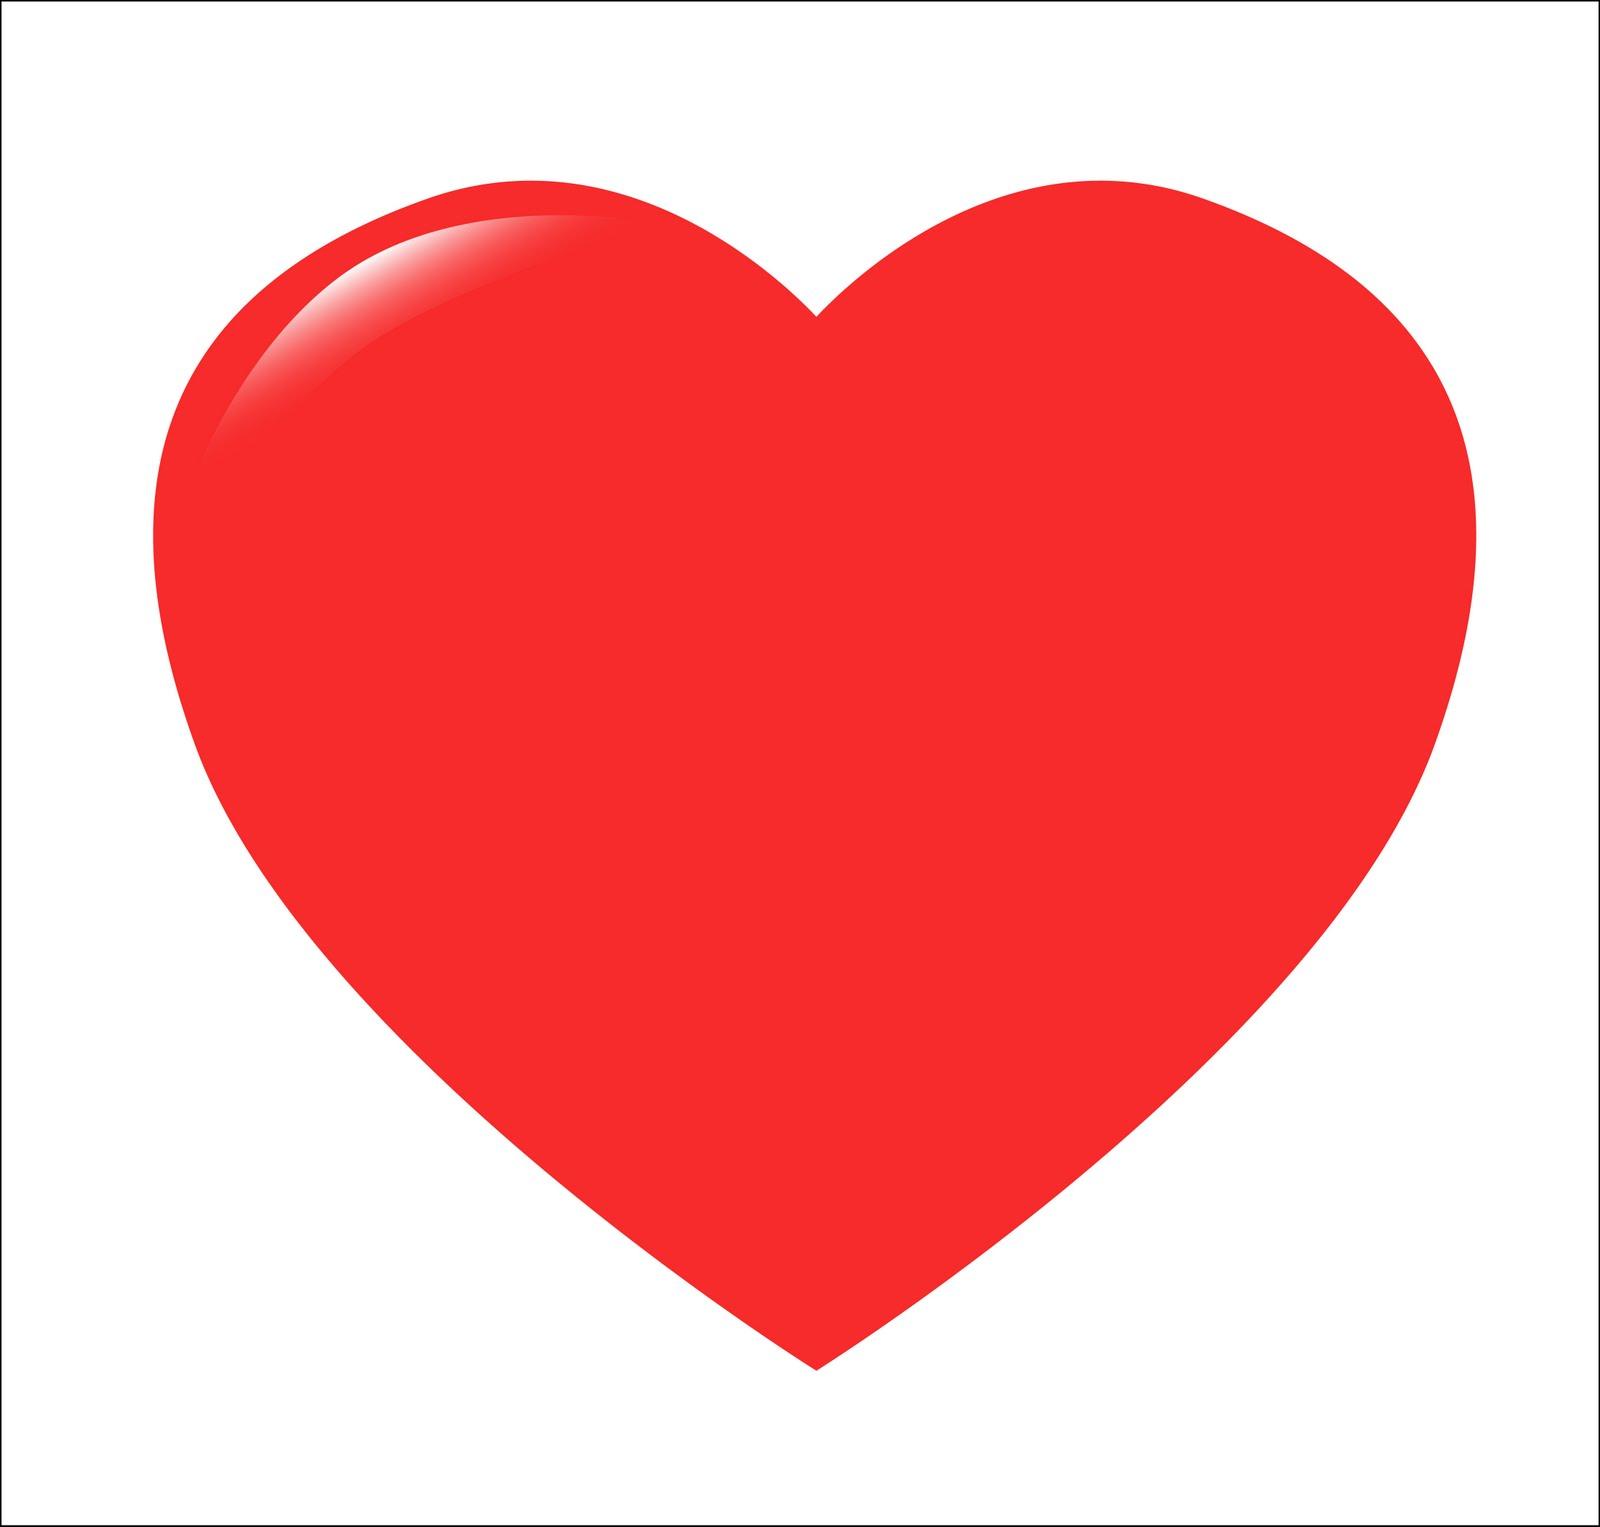 Ilissa banhazl mft 7 things to do alone on valentine 39 s day for Things to do on valentine s day near me